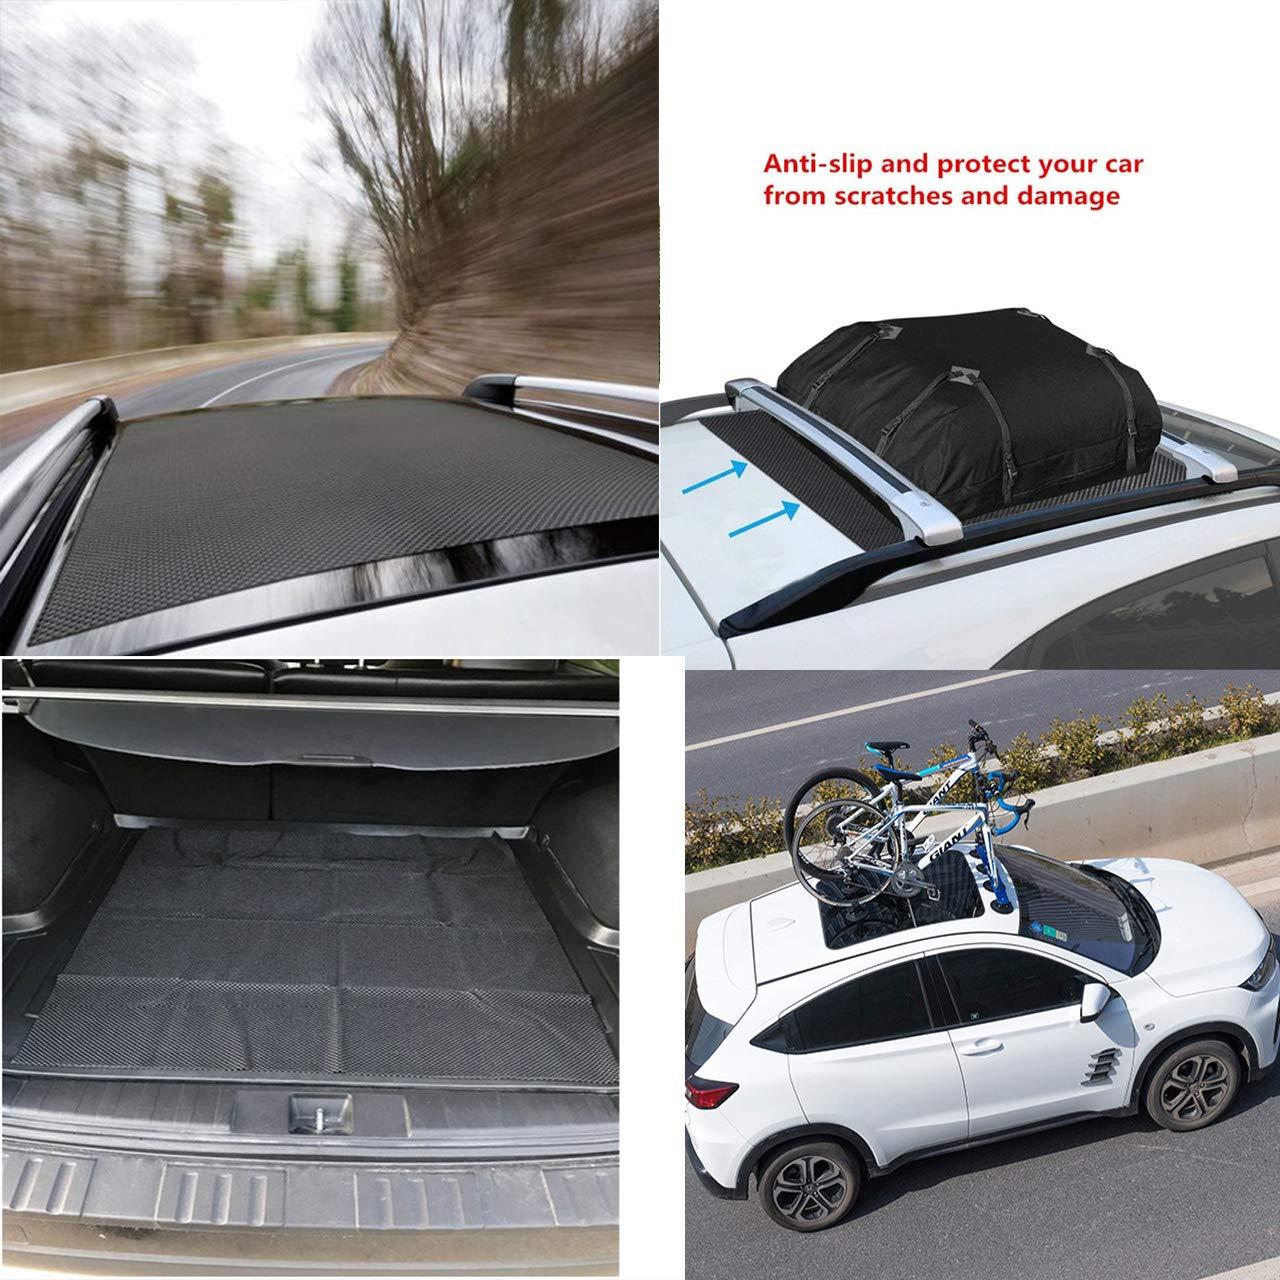 RUNMIND Car Roof Cargo Protective Mat, Anti-Slip Rooftop Rack Bag Pad Work with Roof Rack Crossbar Basket Roof Box Bag Luggage Carrier for Truck SUV Car Van Sedan(39''x36'')